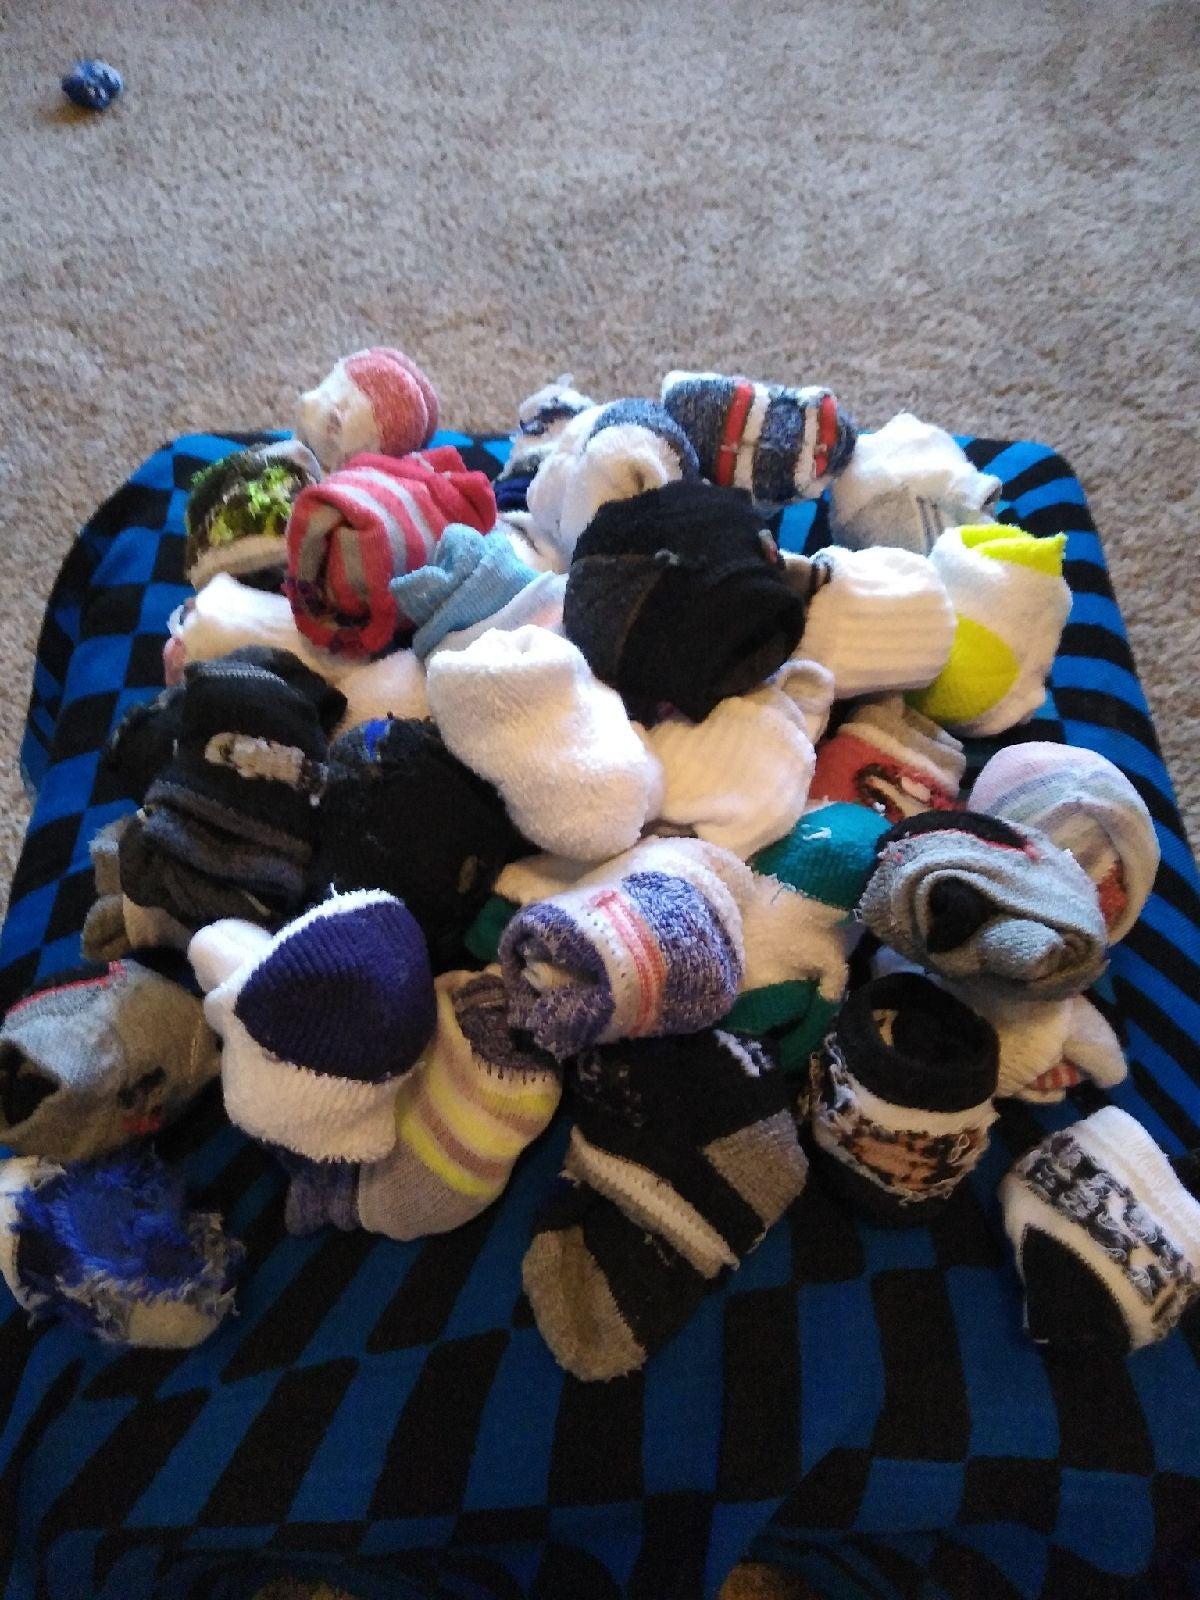 Lot of baby boy socks